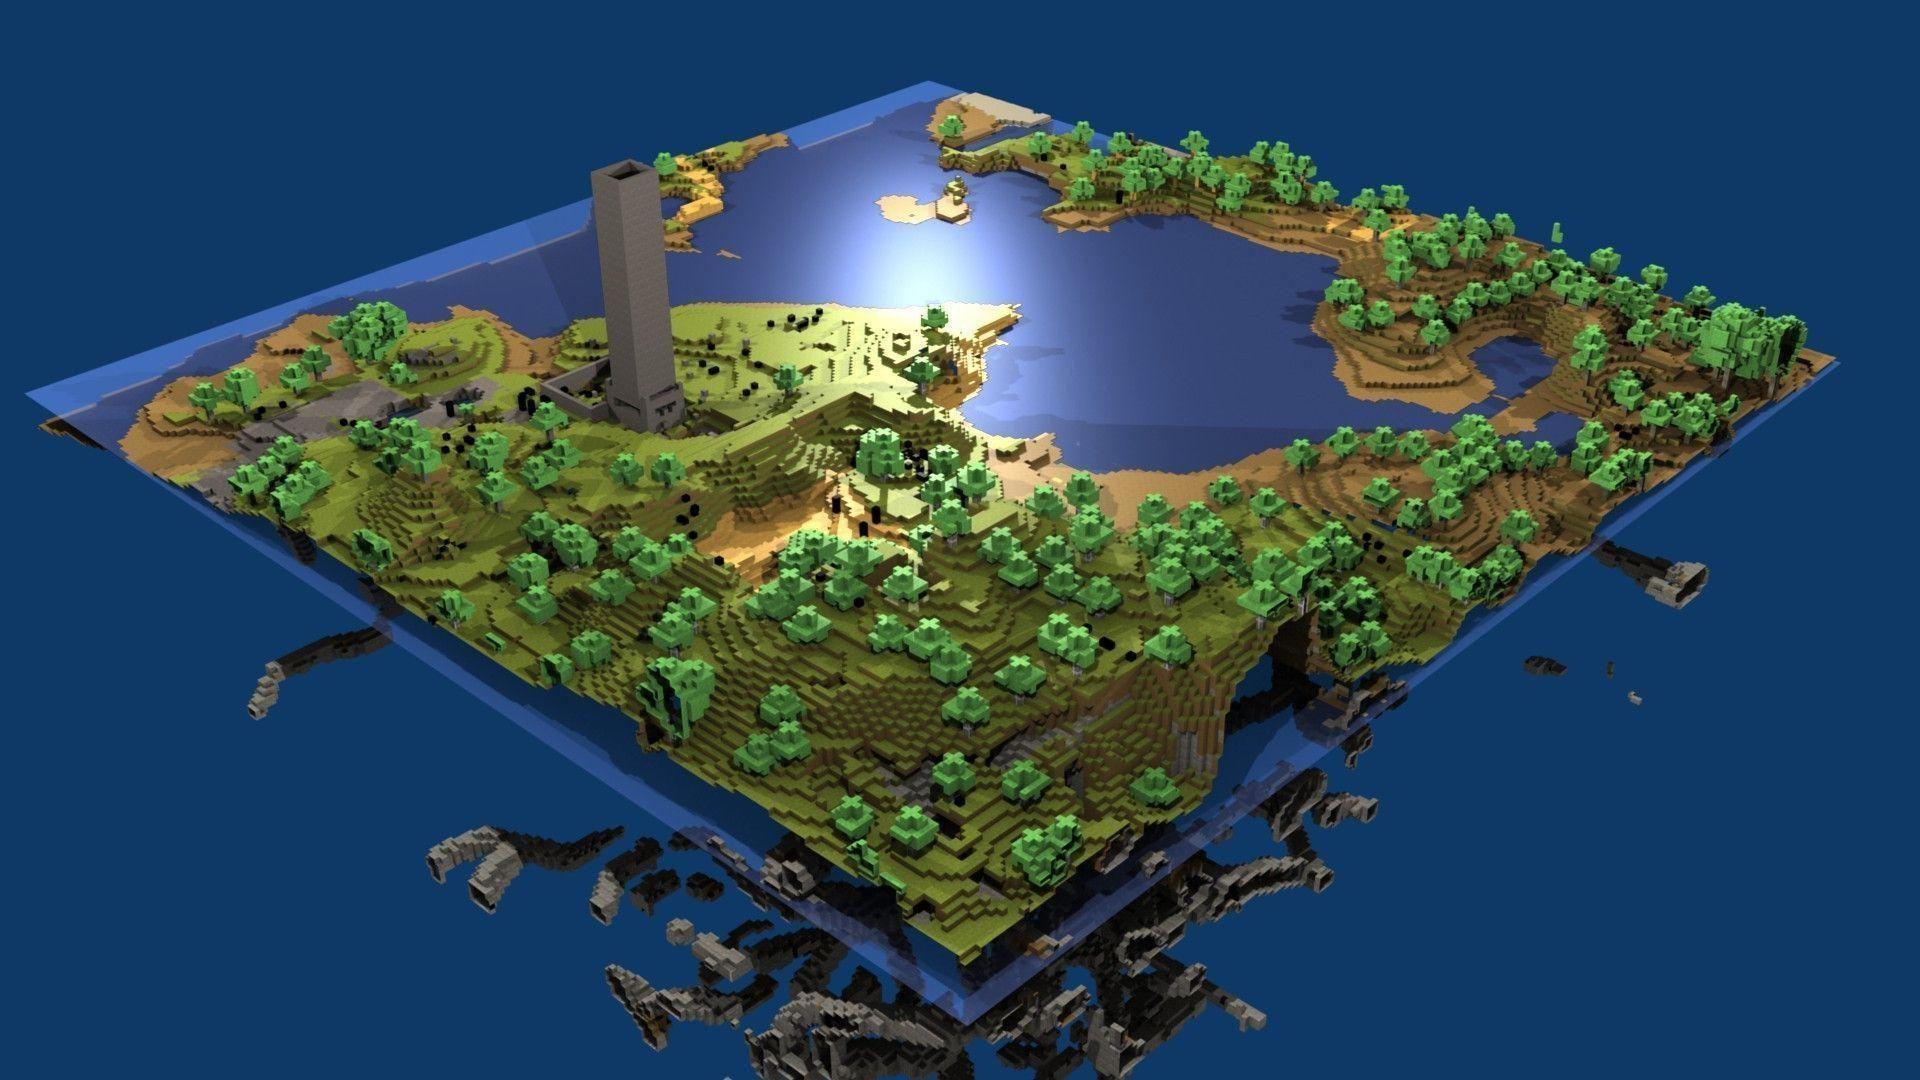 Minecraft Wallpaper HD (80+ Images